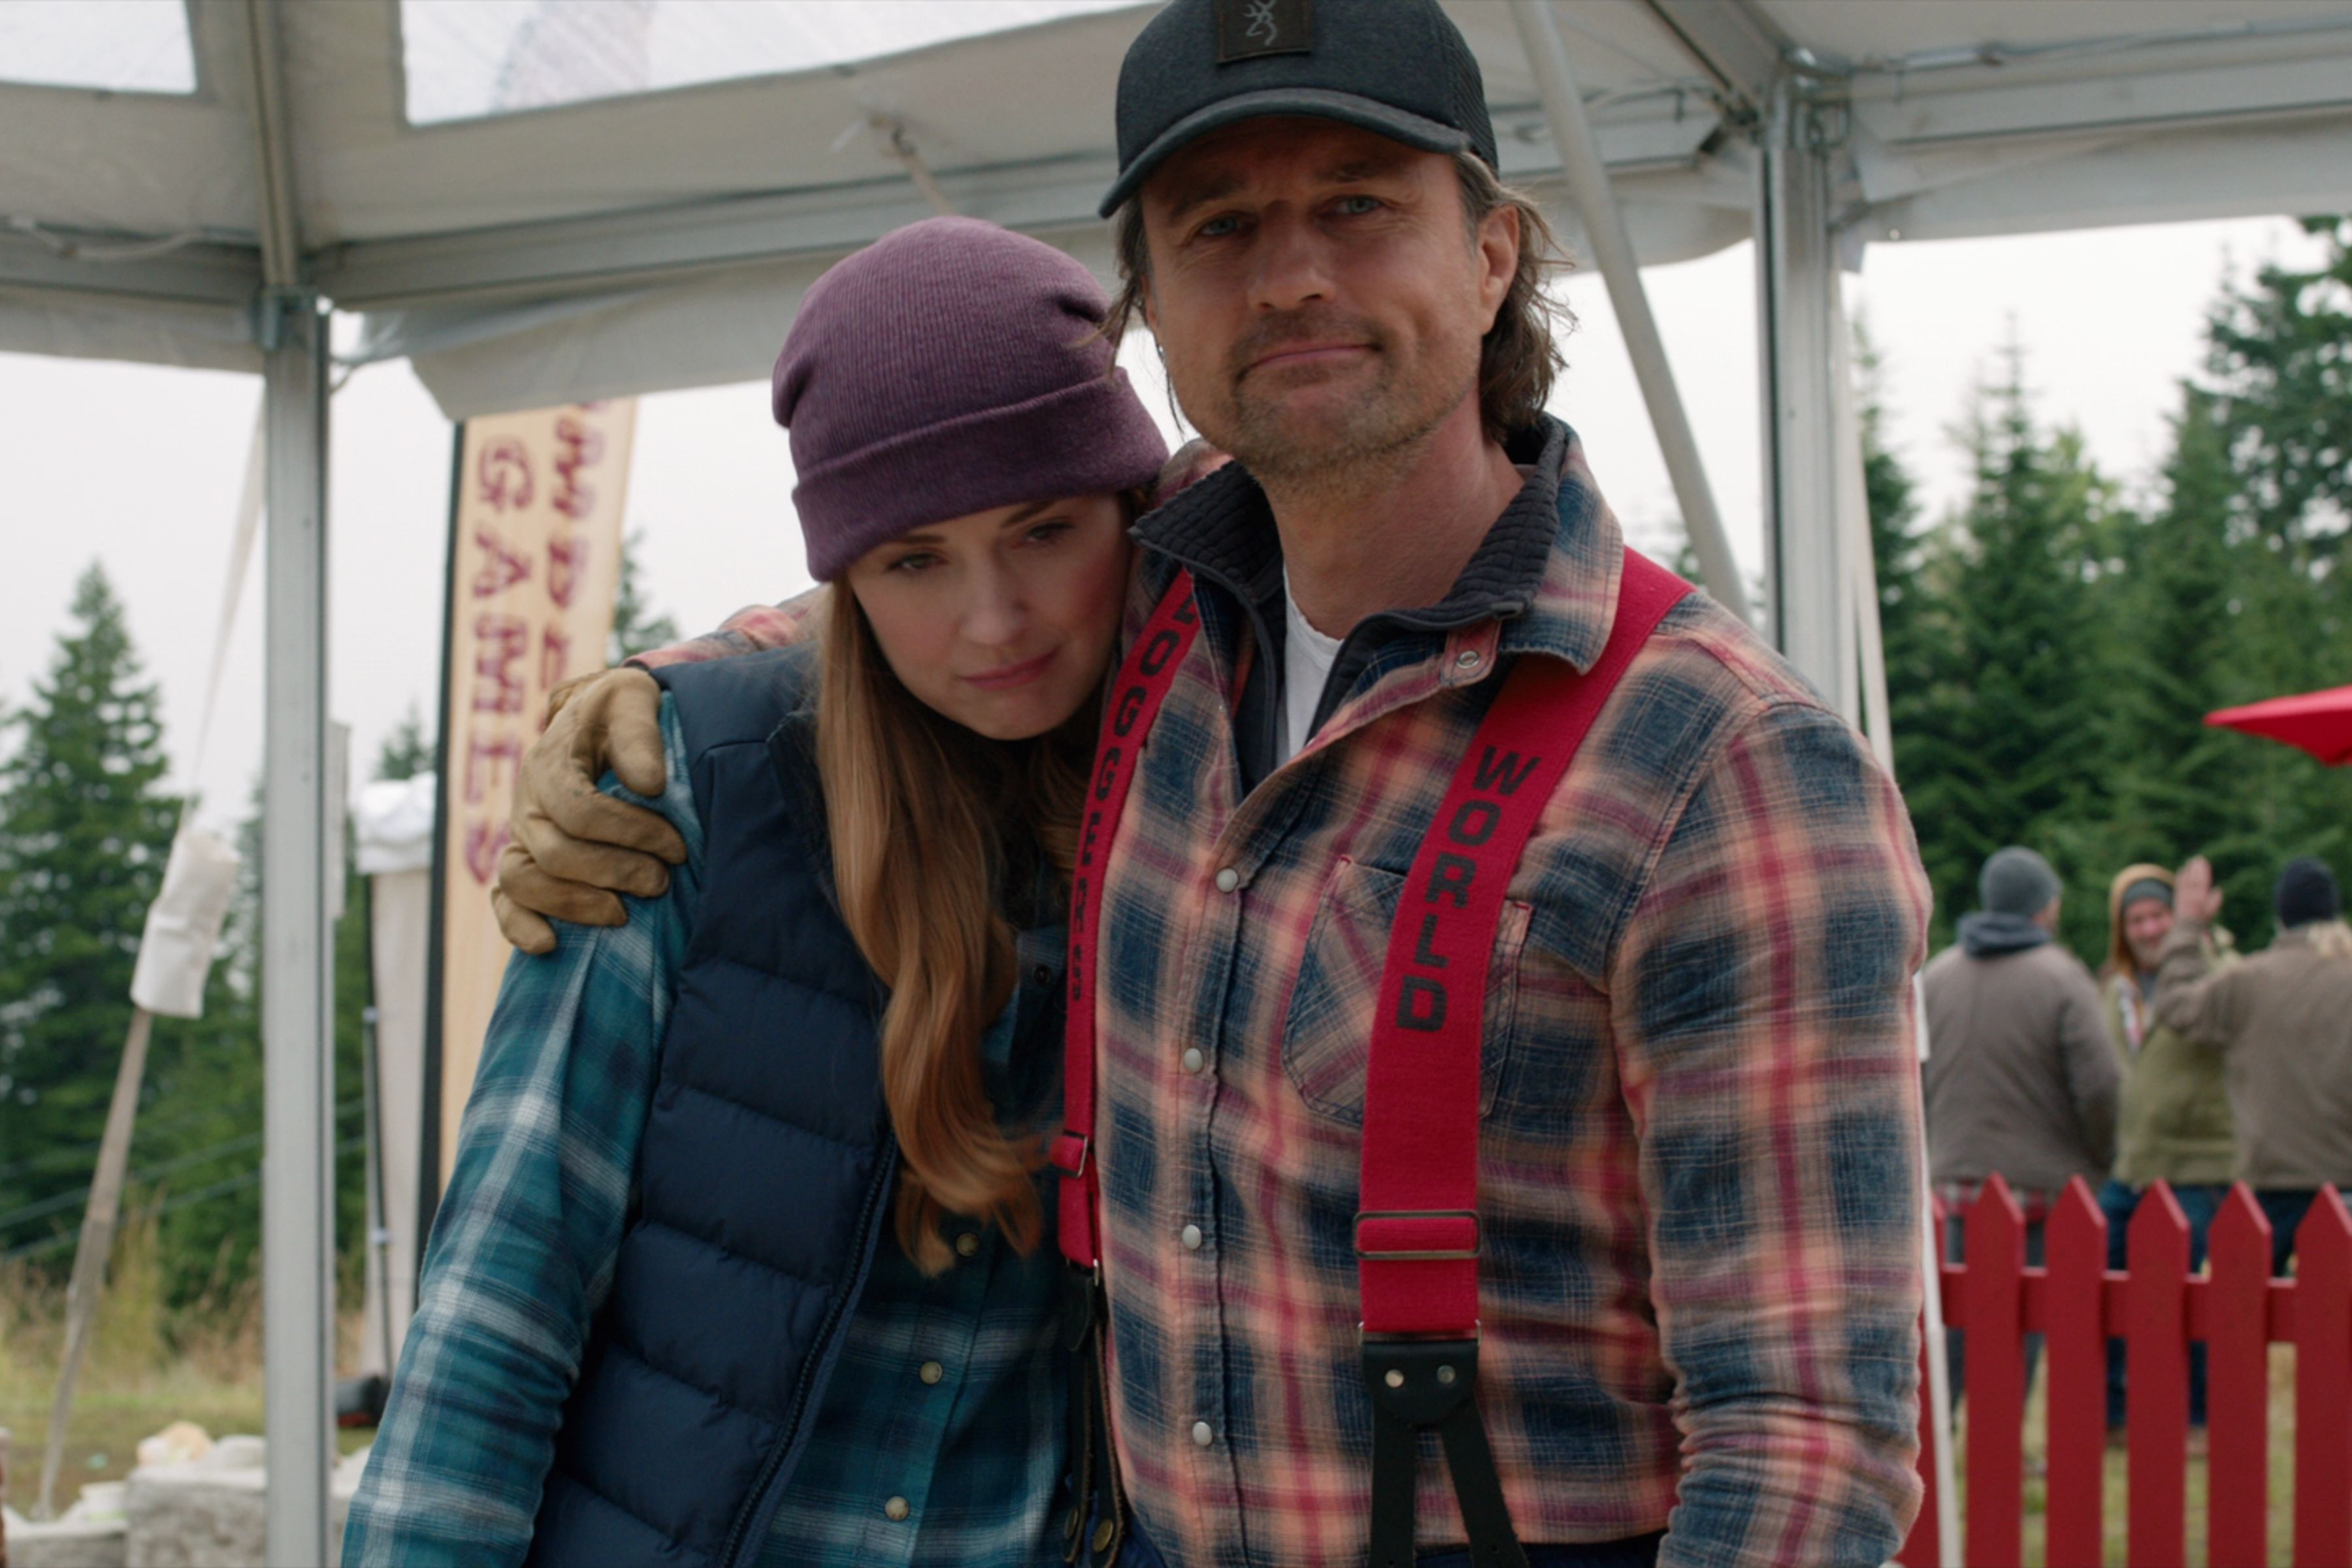 Virgin River' Season 4 | Netflix Release Date, Cast, Plot